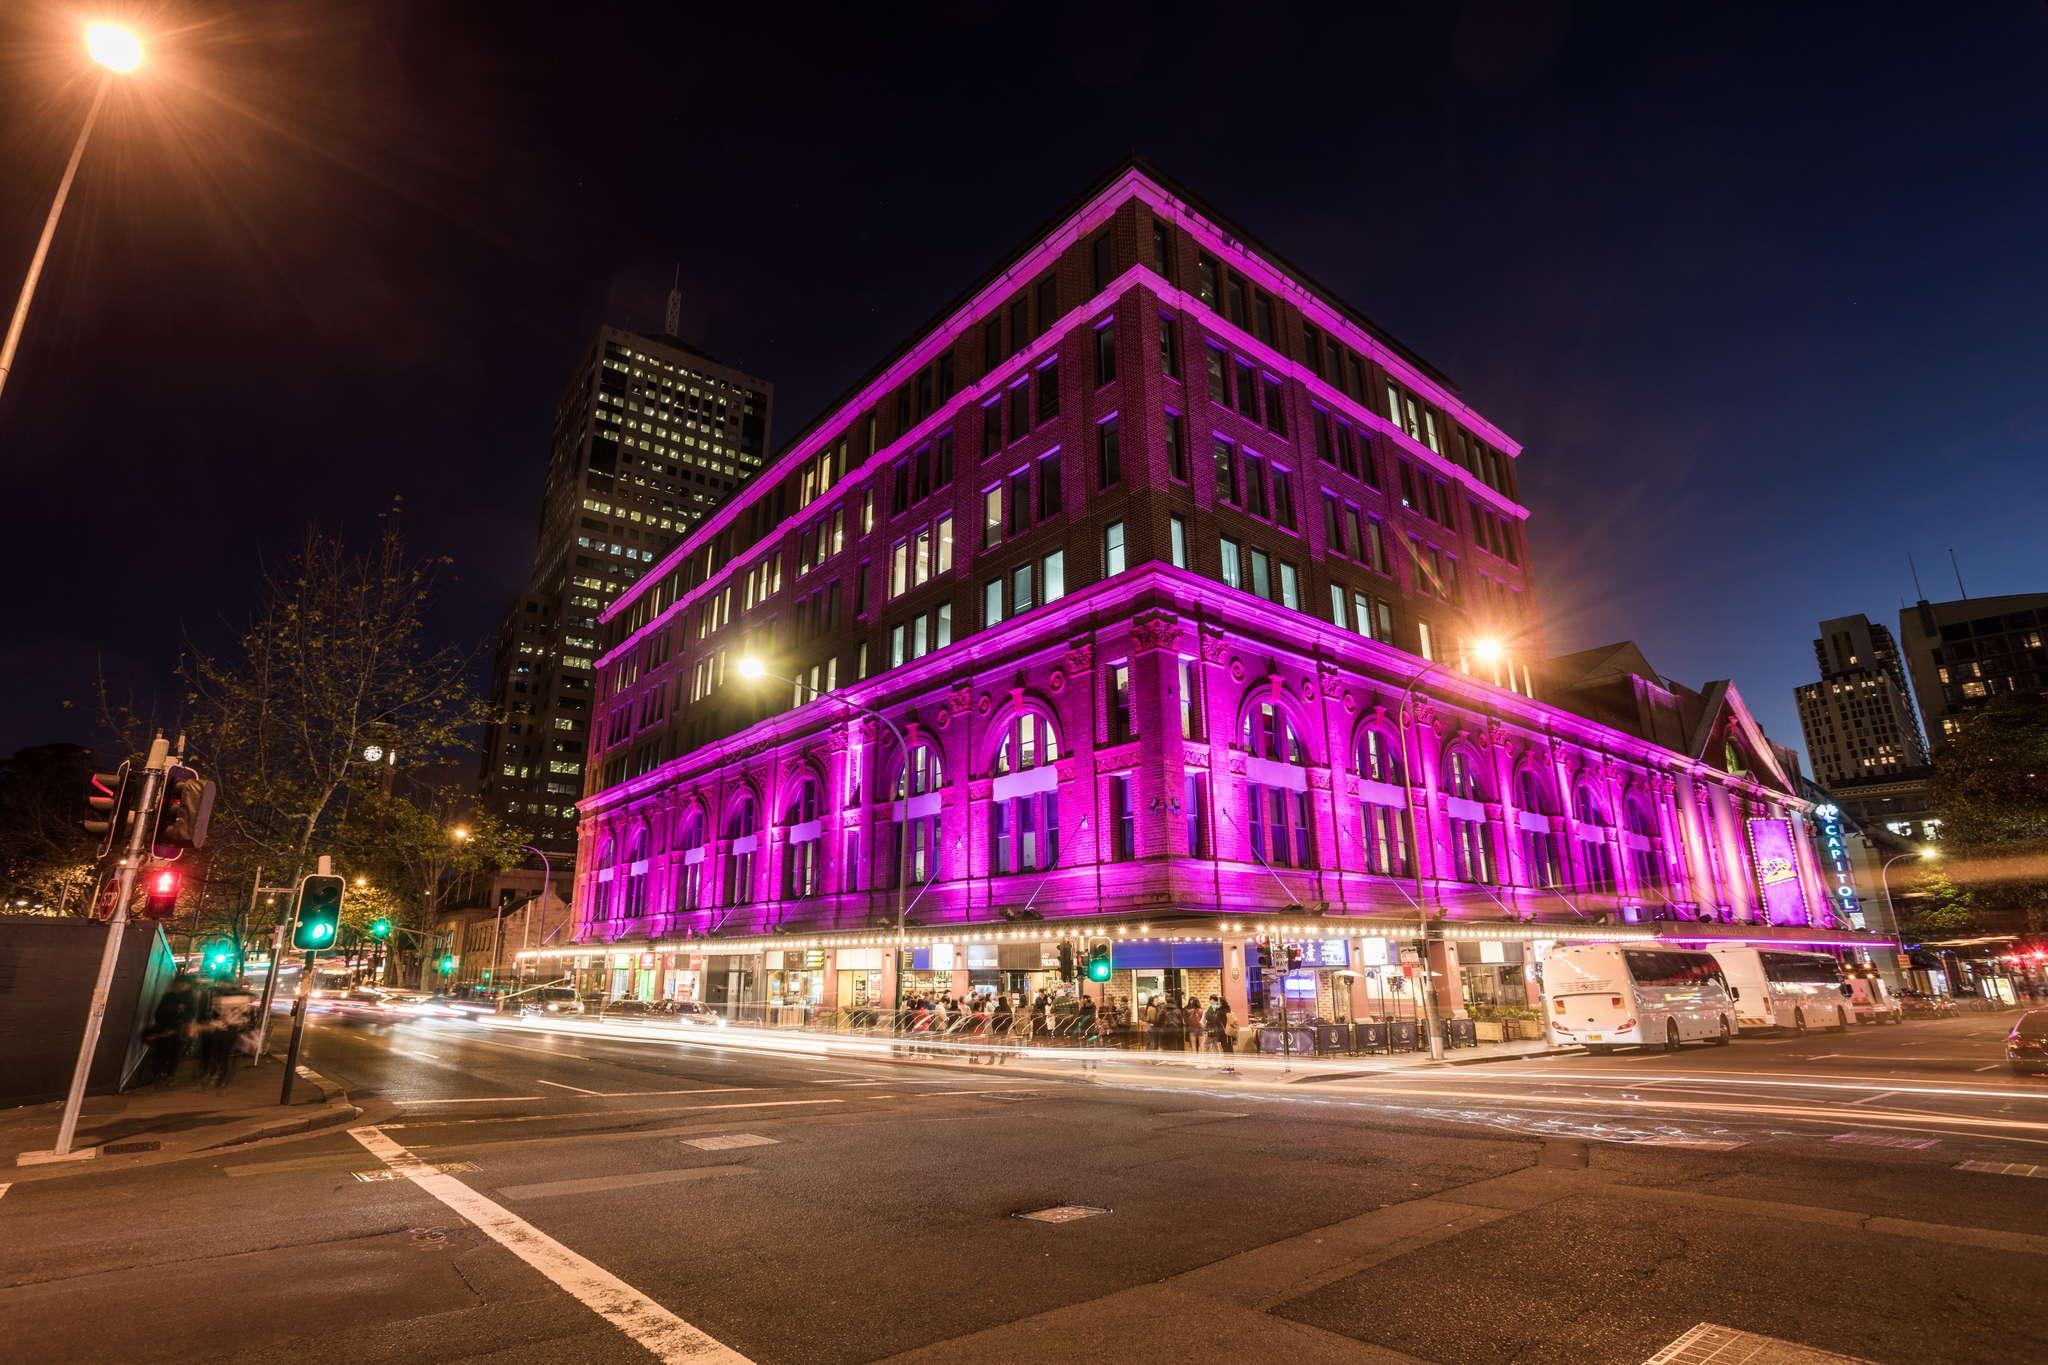 International_College_of_Management_Sydney_8_190720_ICMS-472